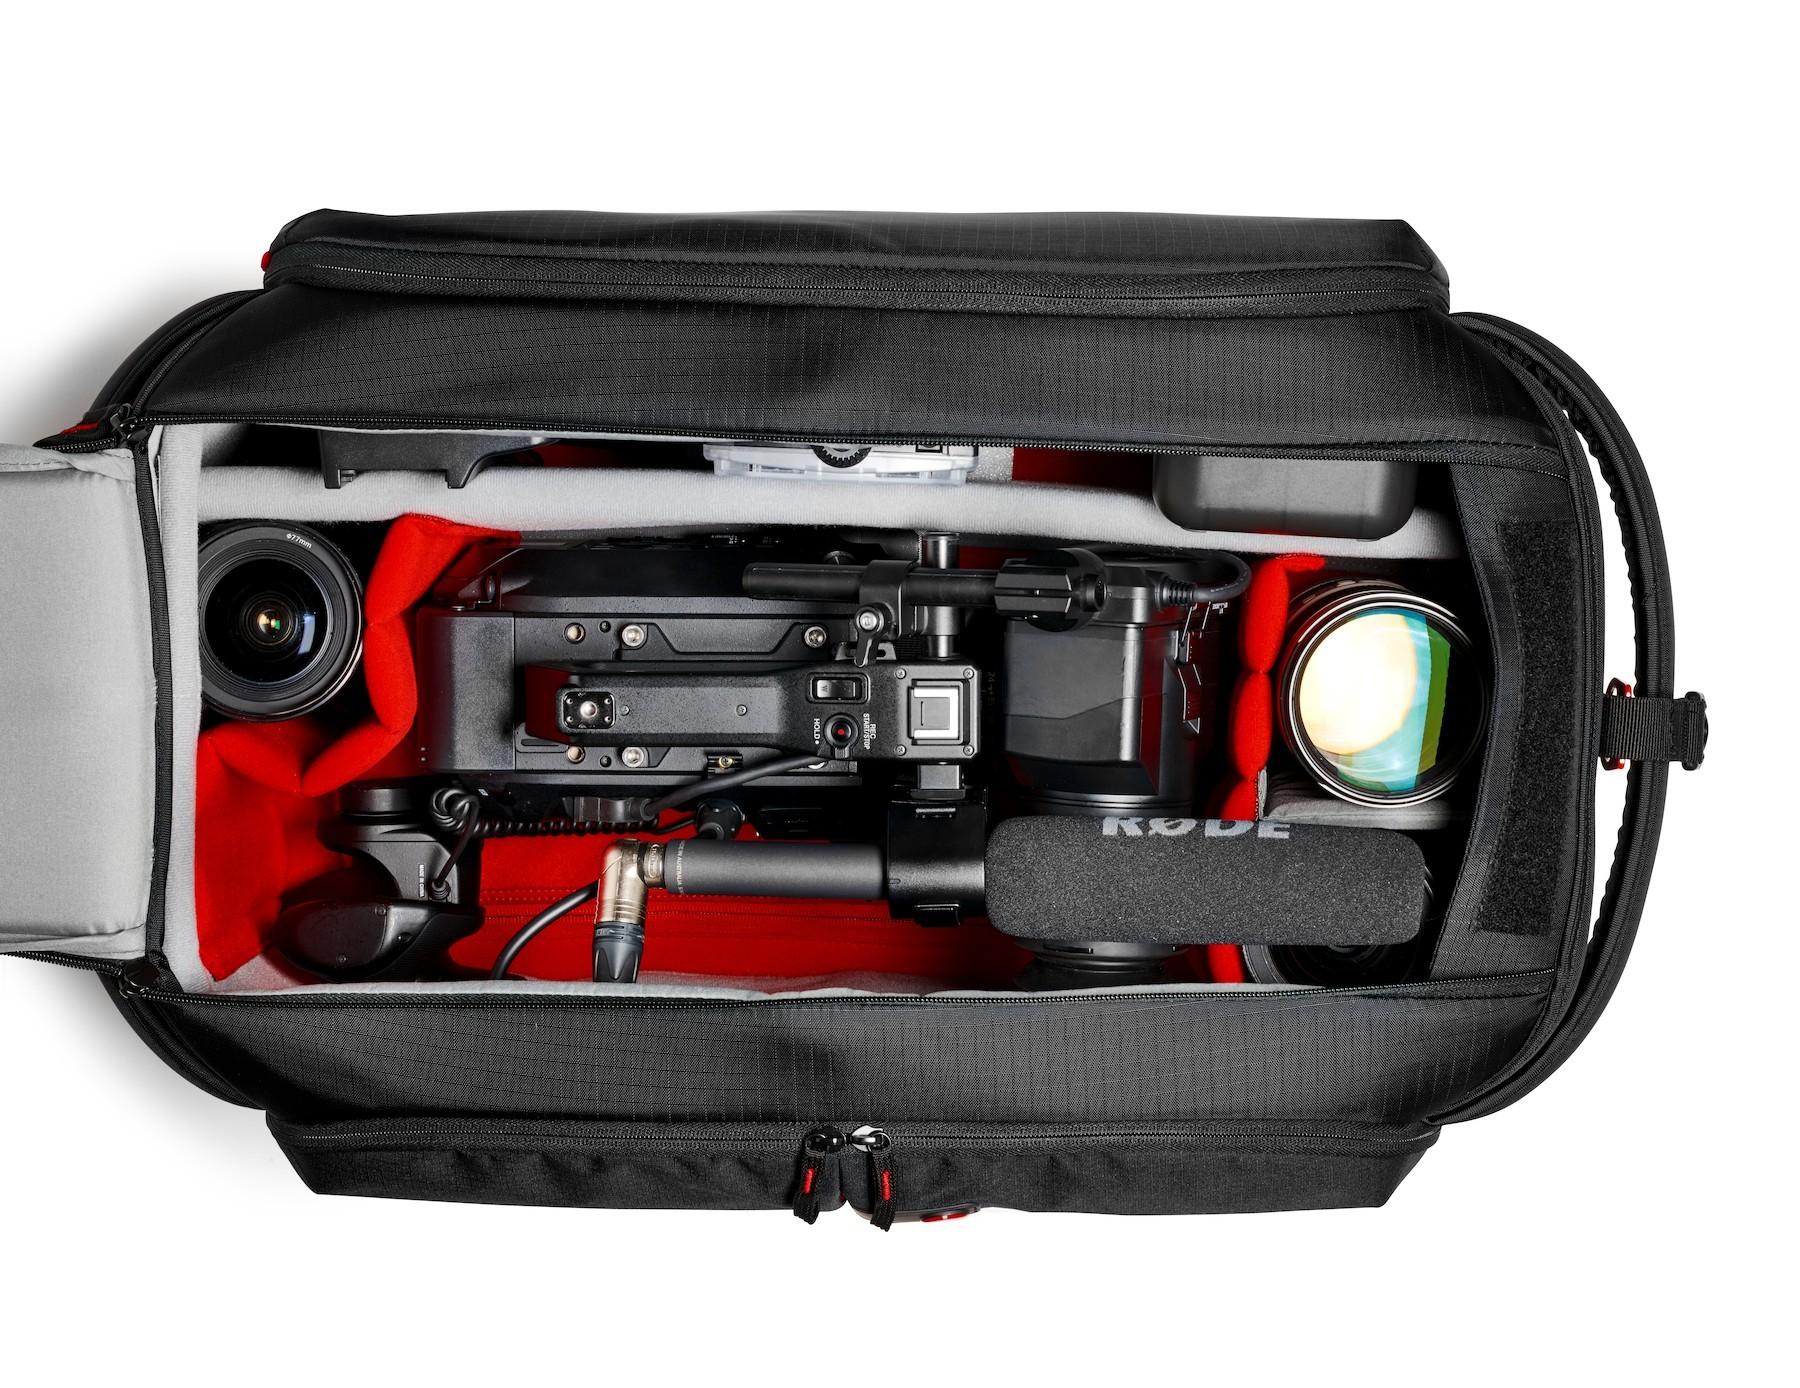 Manfrotto Pro Light Video PL-CC-195N